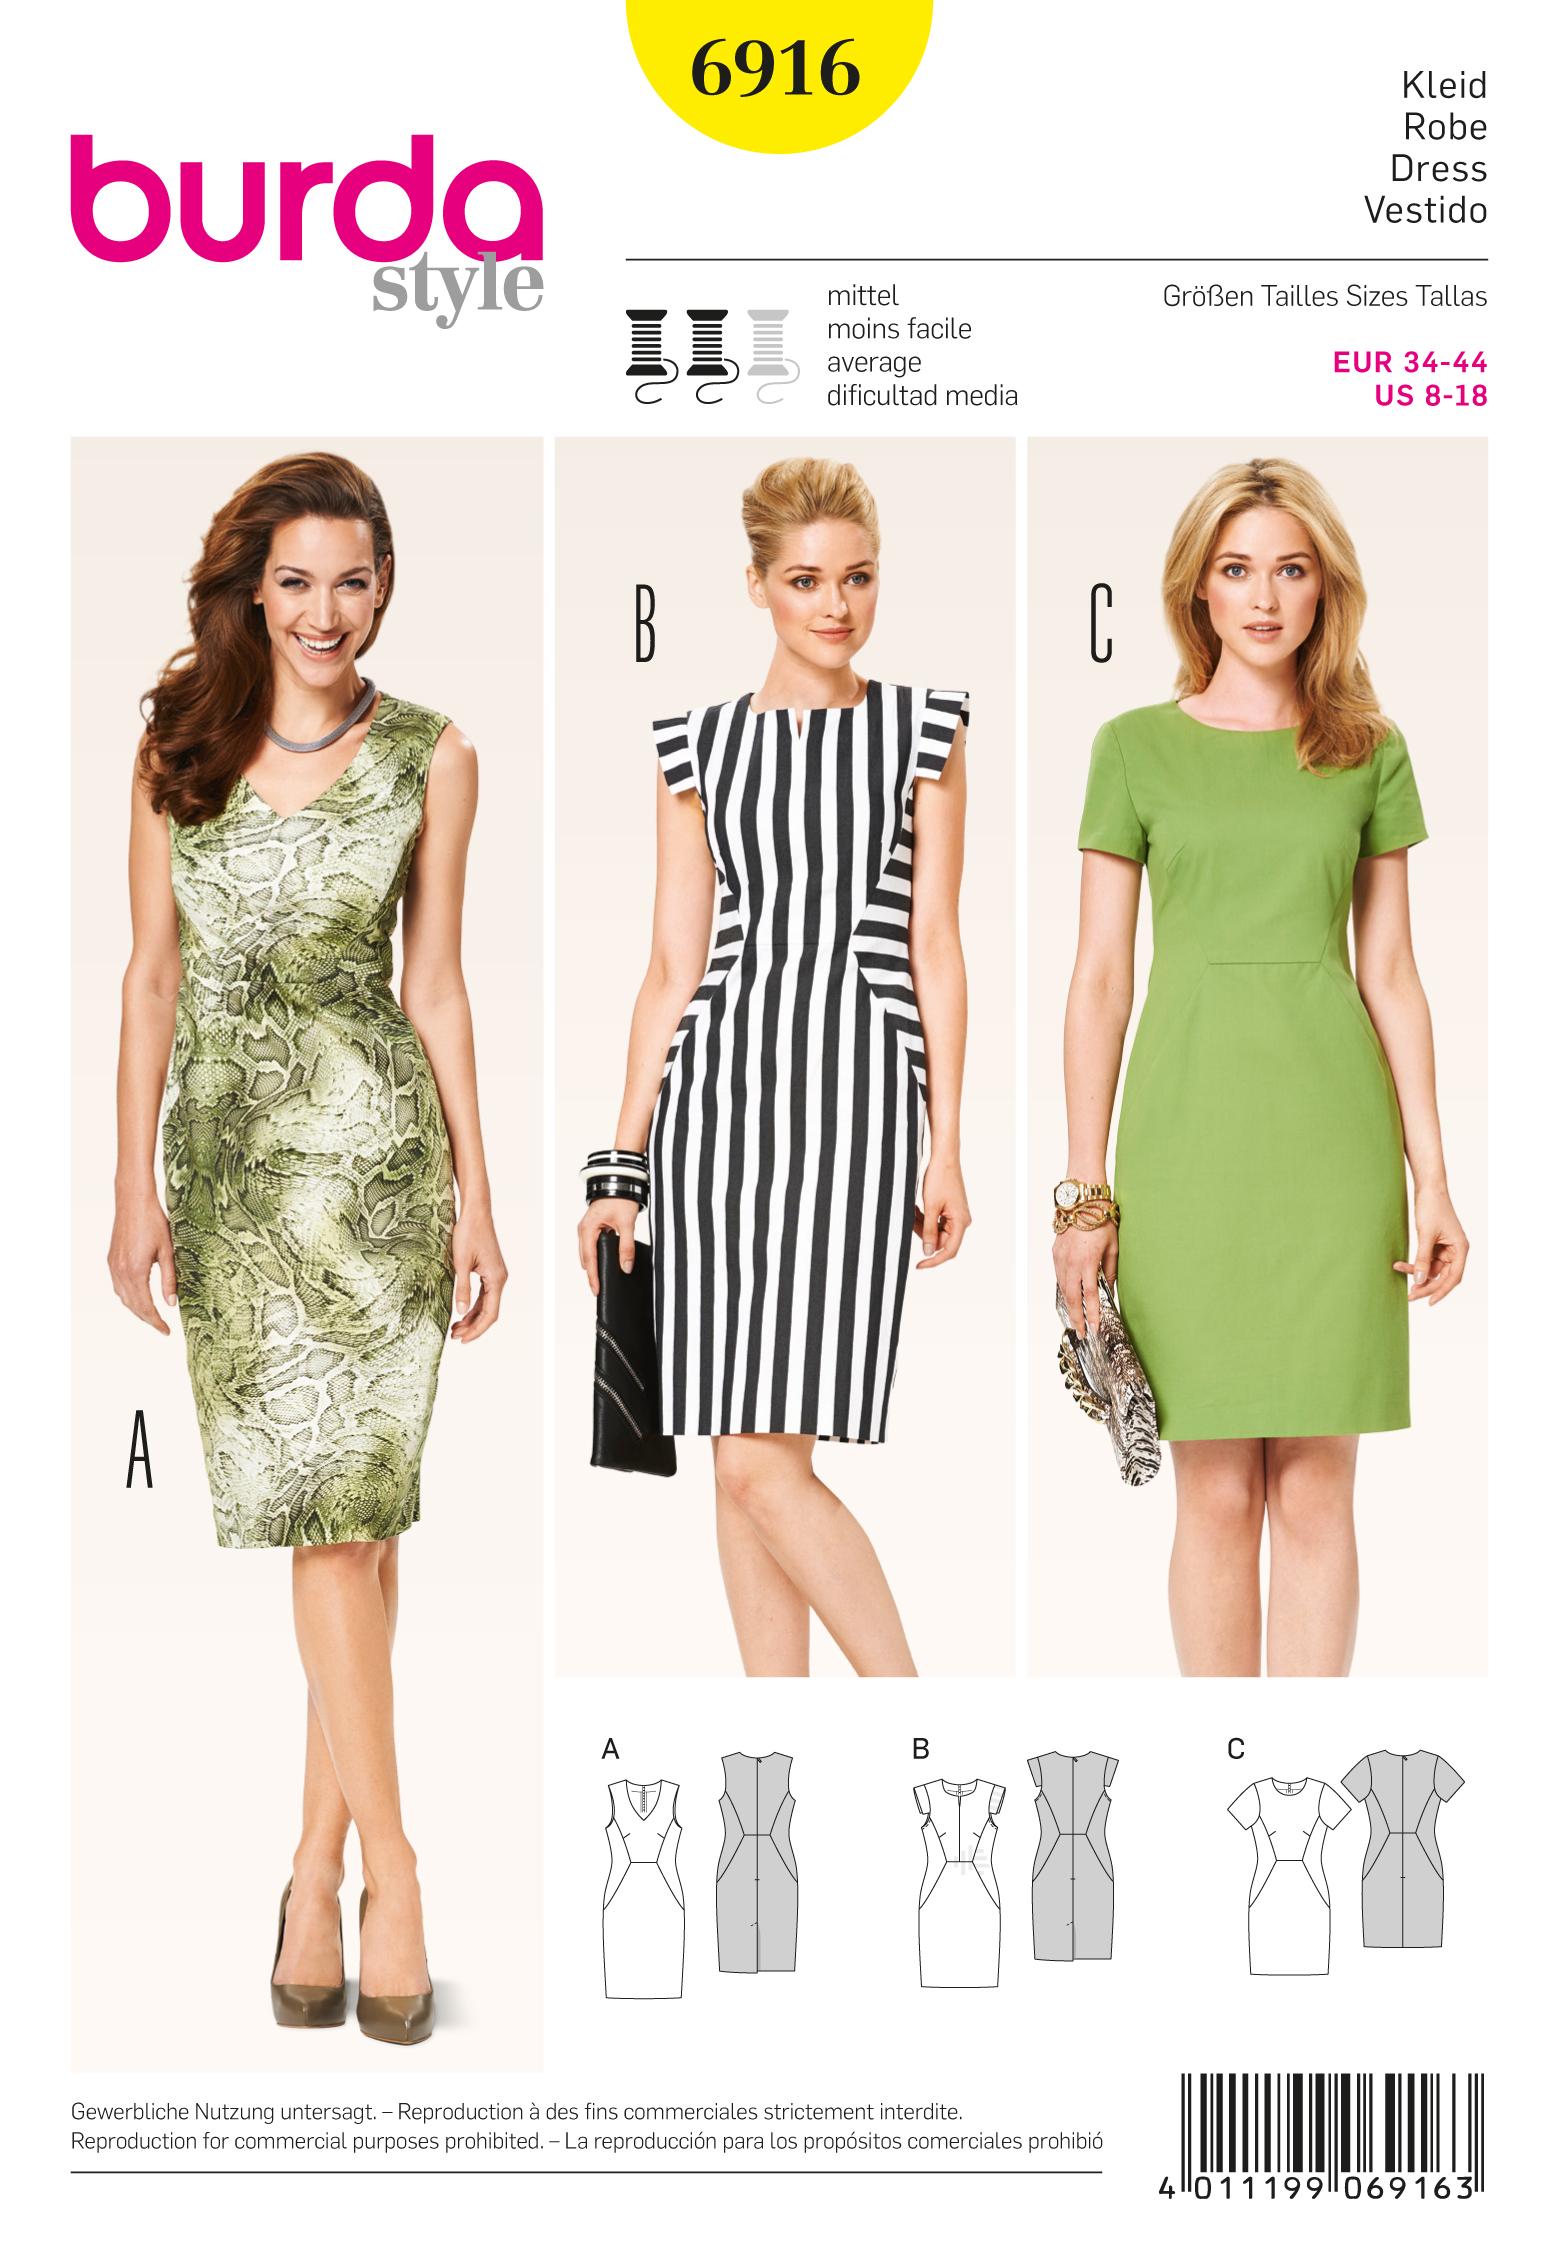 Burda Dresses 6916